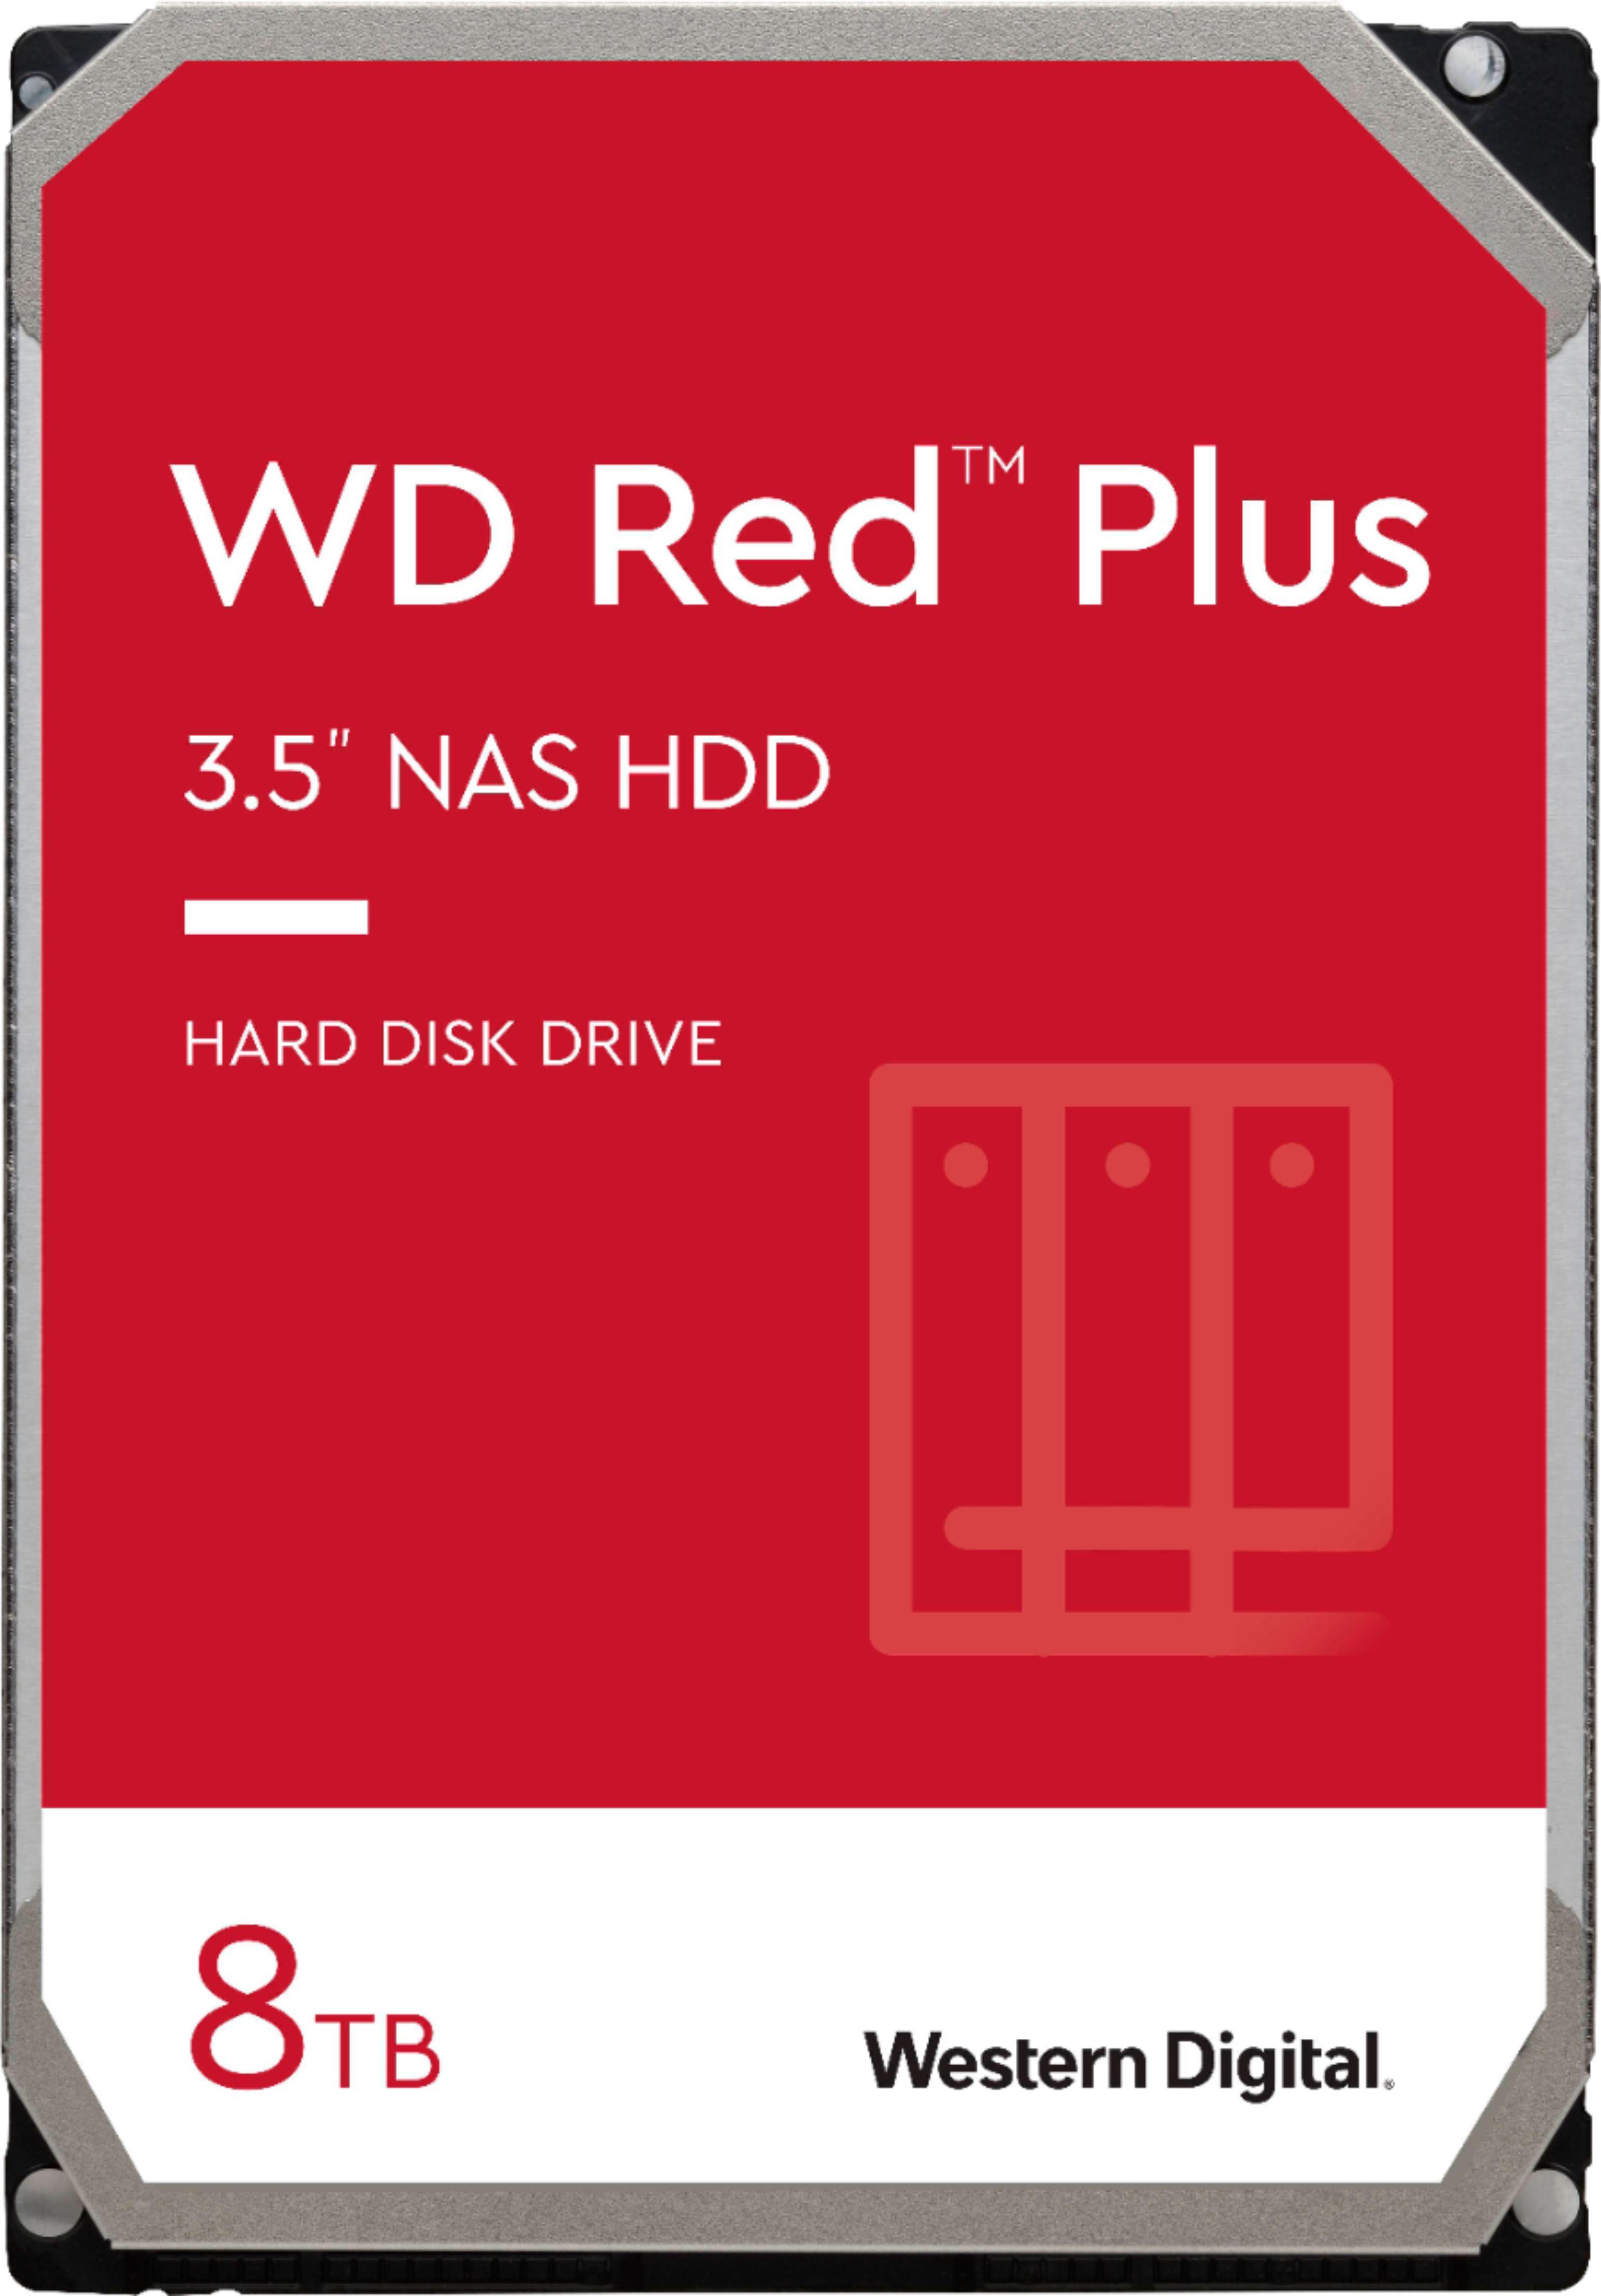 WD Red Plus 8TB Internal SATA NAS Hard Drive $187.99